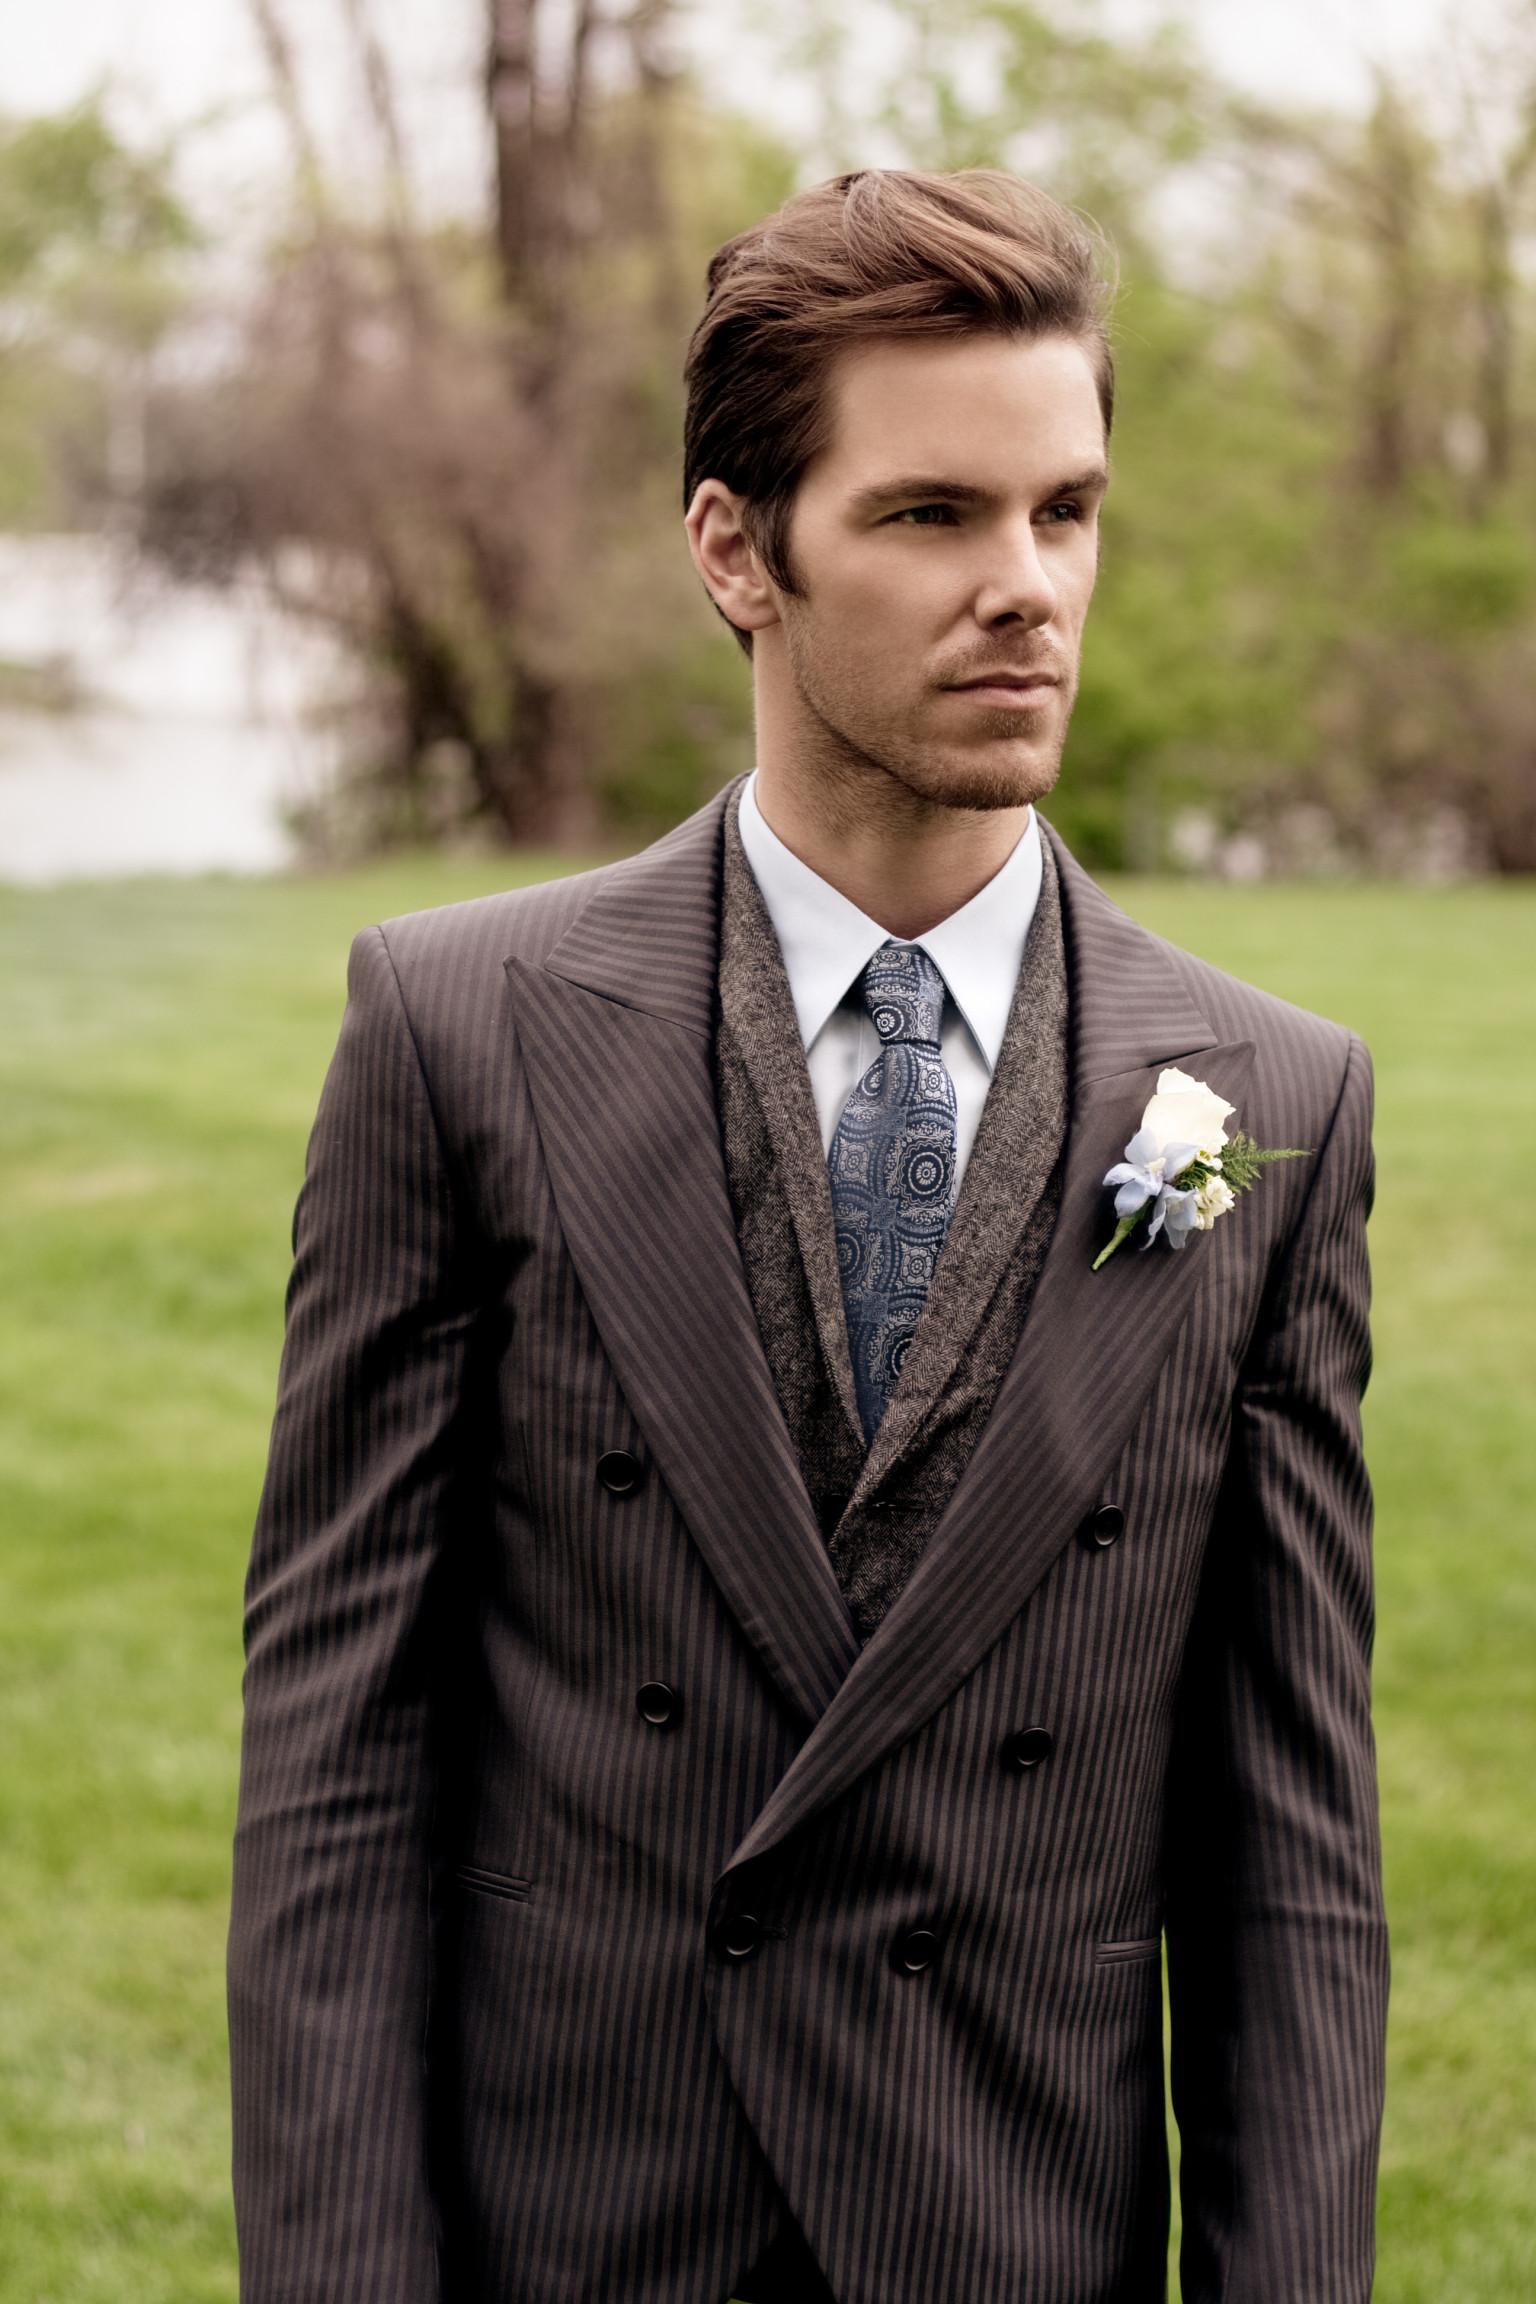 Formal Wedding Attire Male Guests